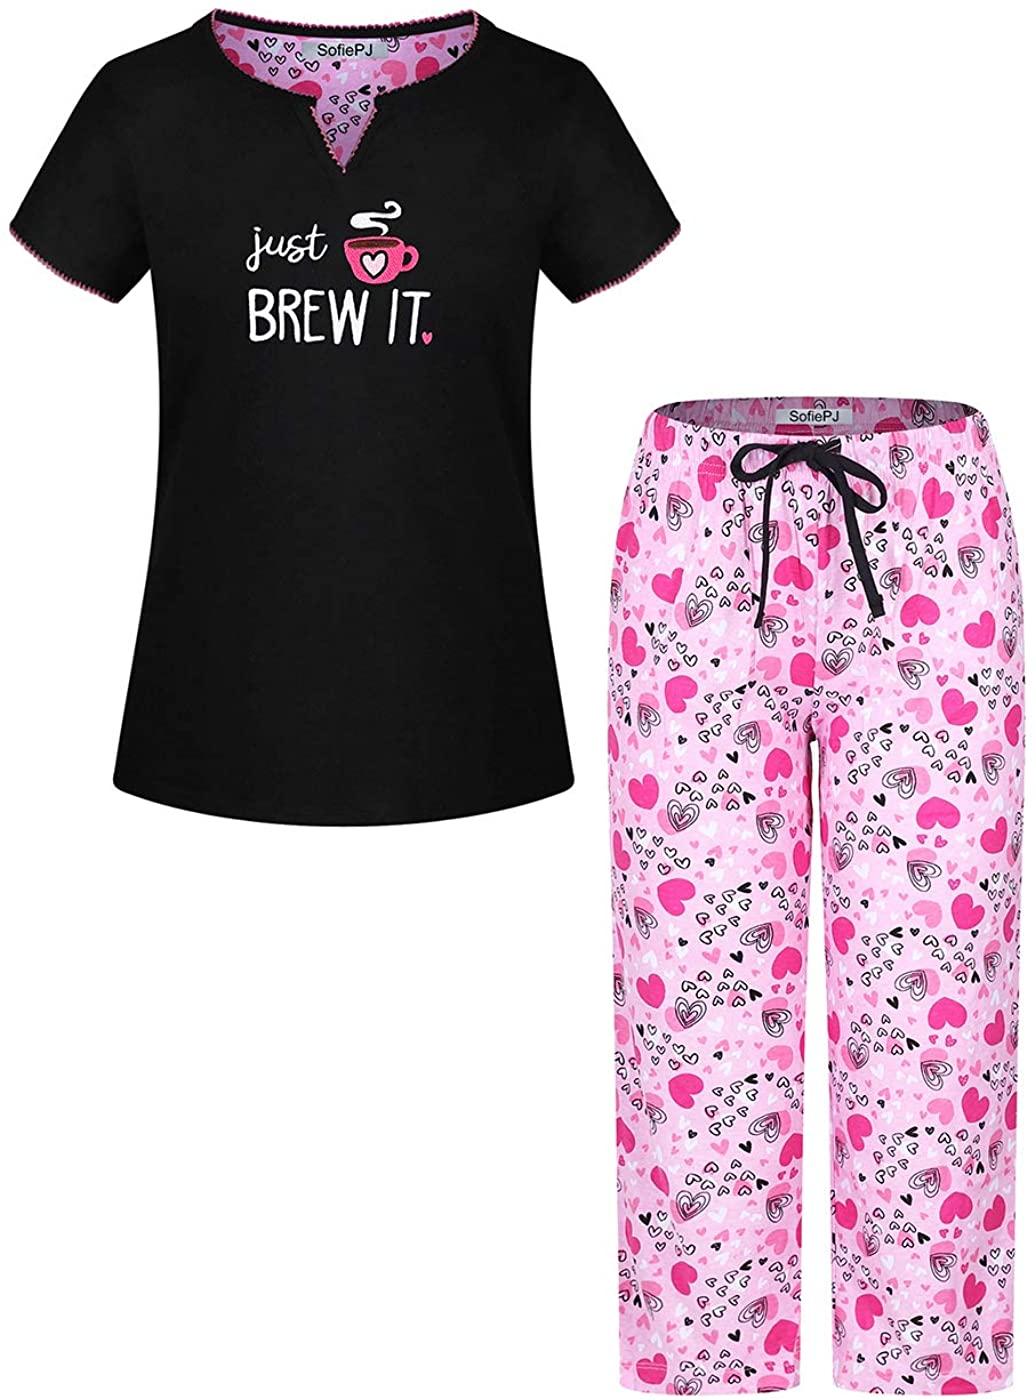 SofiePJ Women's Printed Short Sleeve Pure Cotton Sleepwear Capri Set